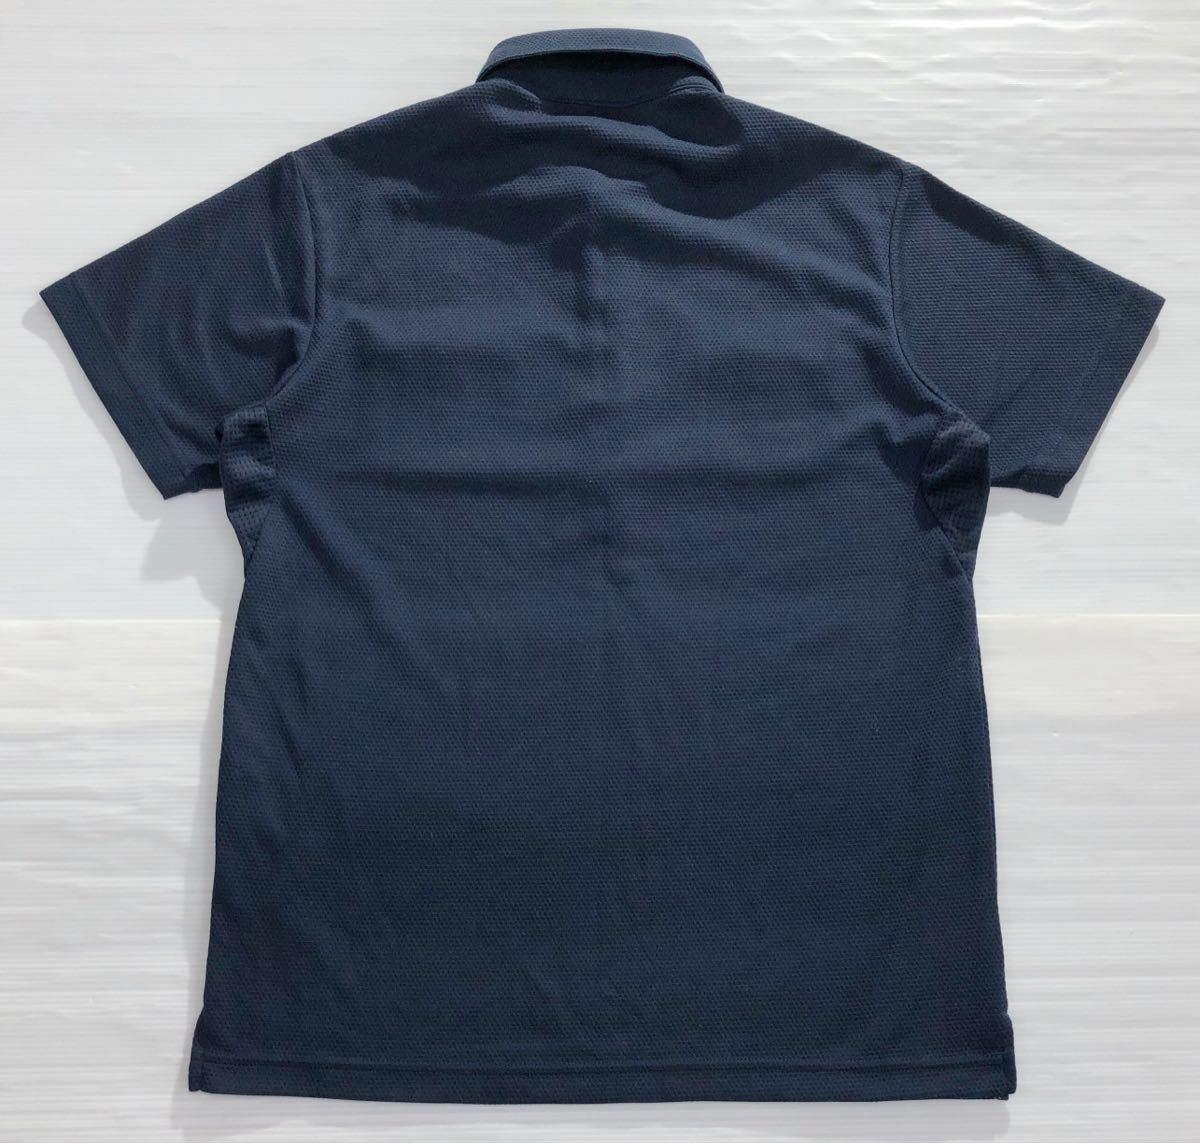 《le coq sportif GOLF ルコックゴルフ》ロゴ FR-03刺繍 半袖 ポロシャツ ネイビー M_画像2